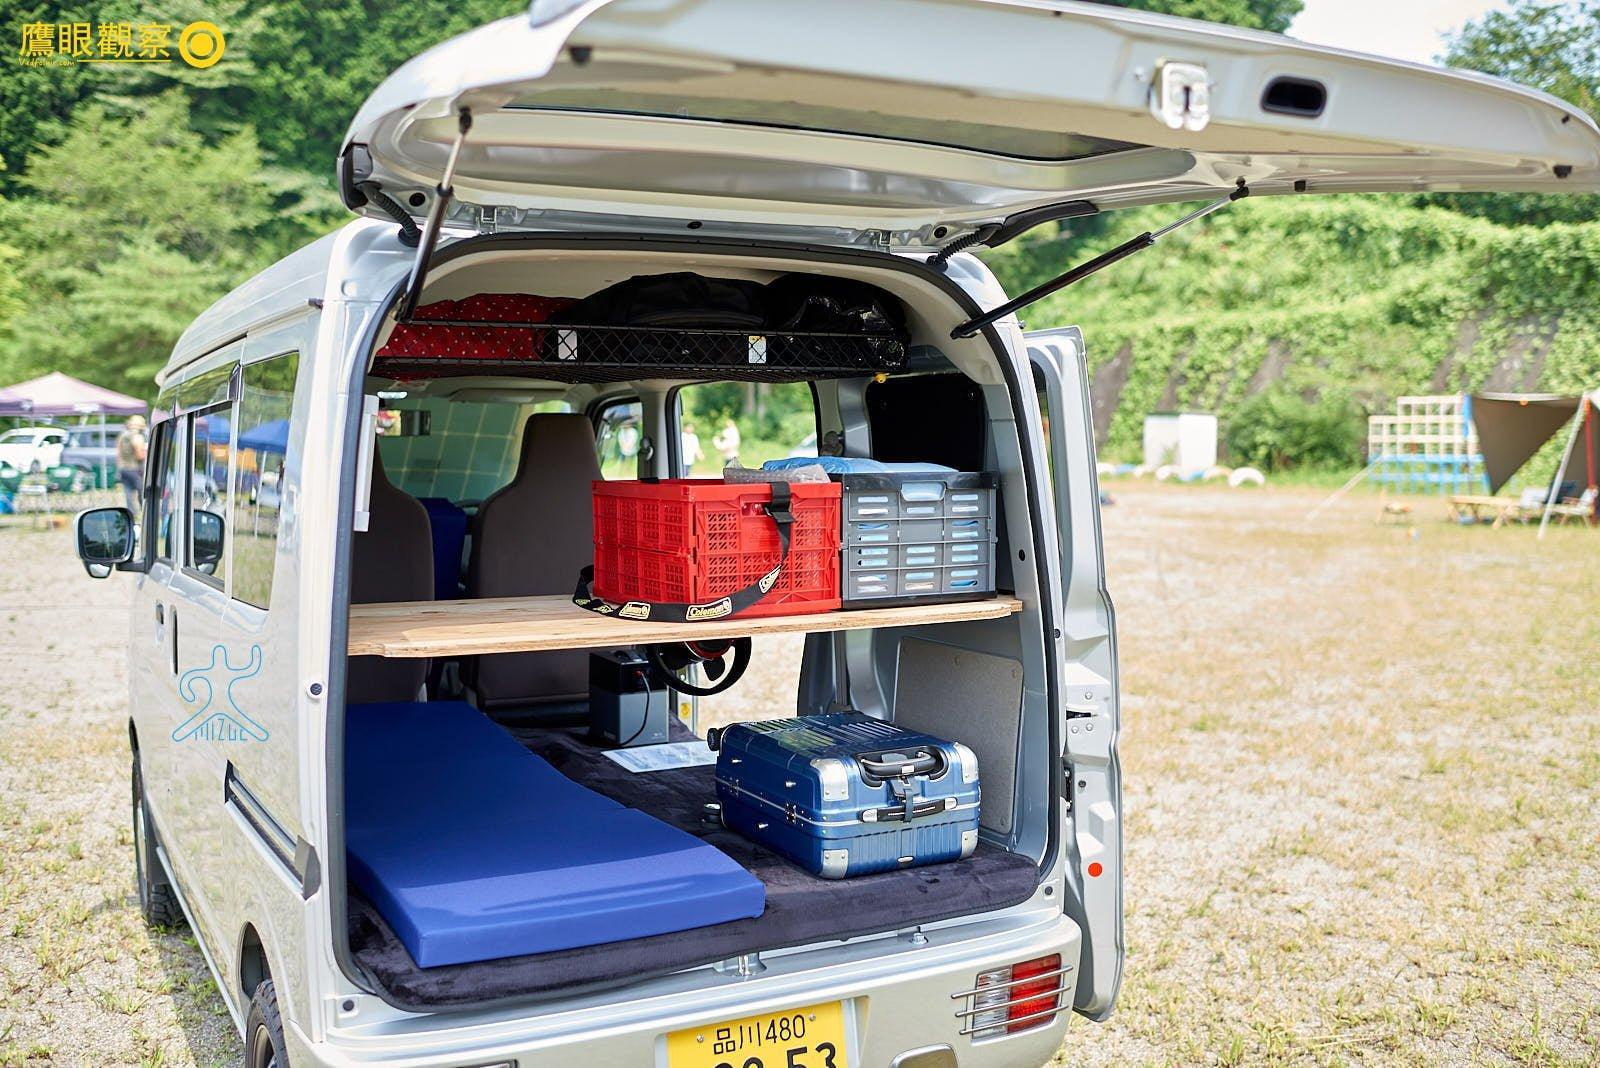 Japan Travel RV Camper School 20190817104758 日本廢棄小學 🚗 RV 休旅車露營、森林探險之旅(櫪木縣鹿沼市立久我小學)🇯🇵⛺️